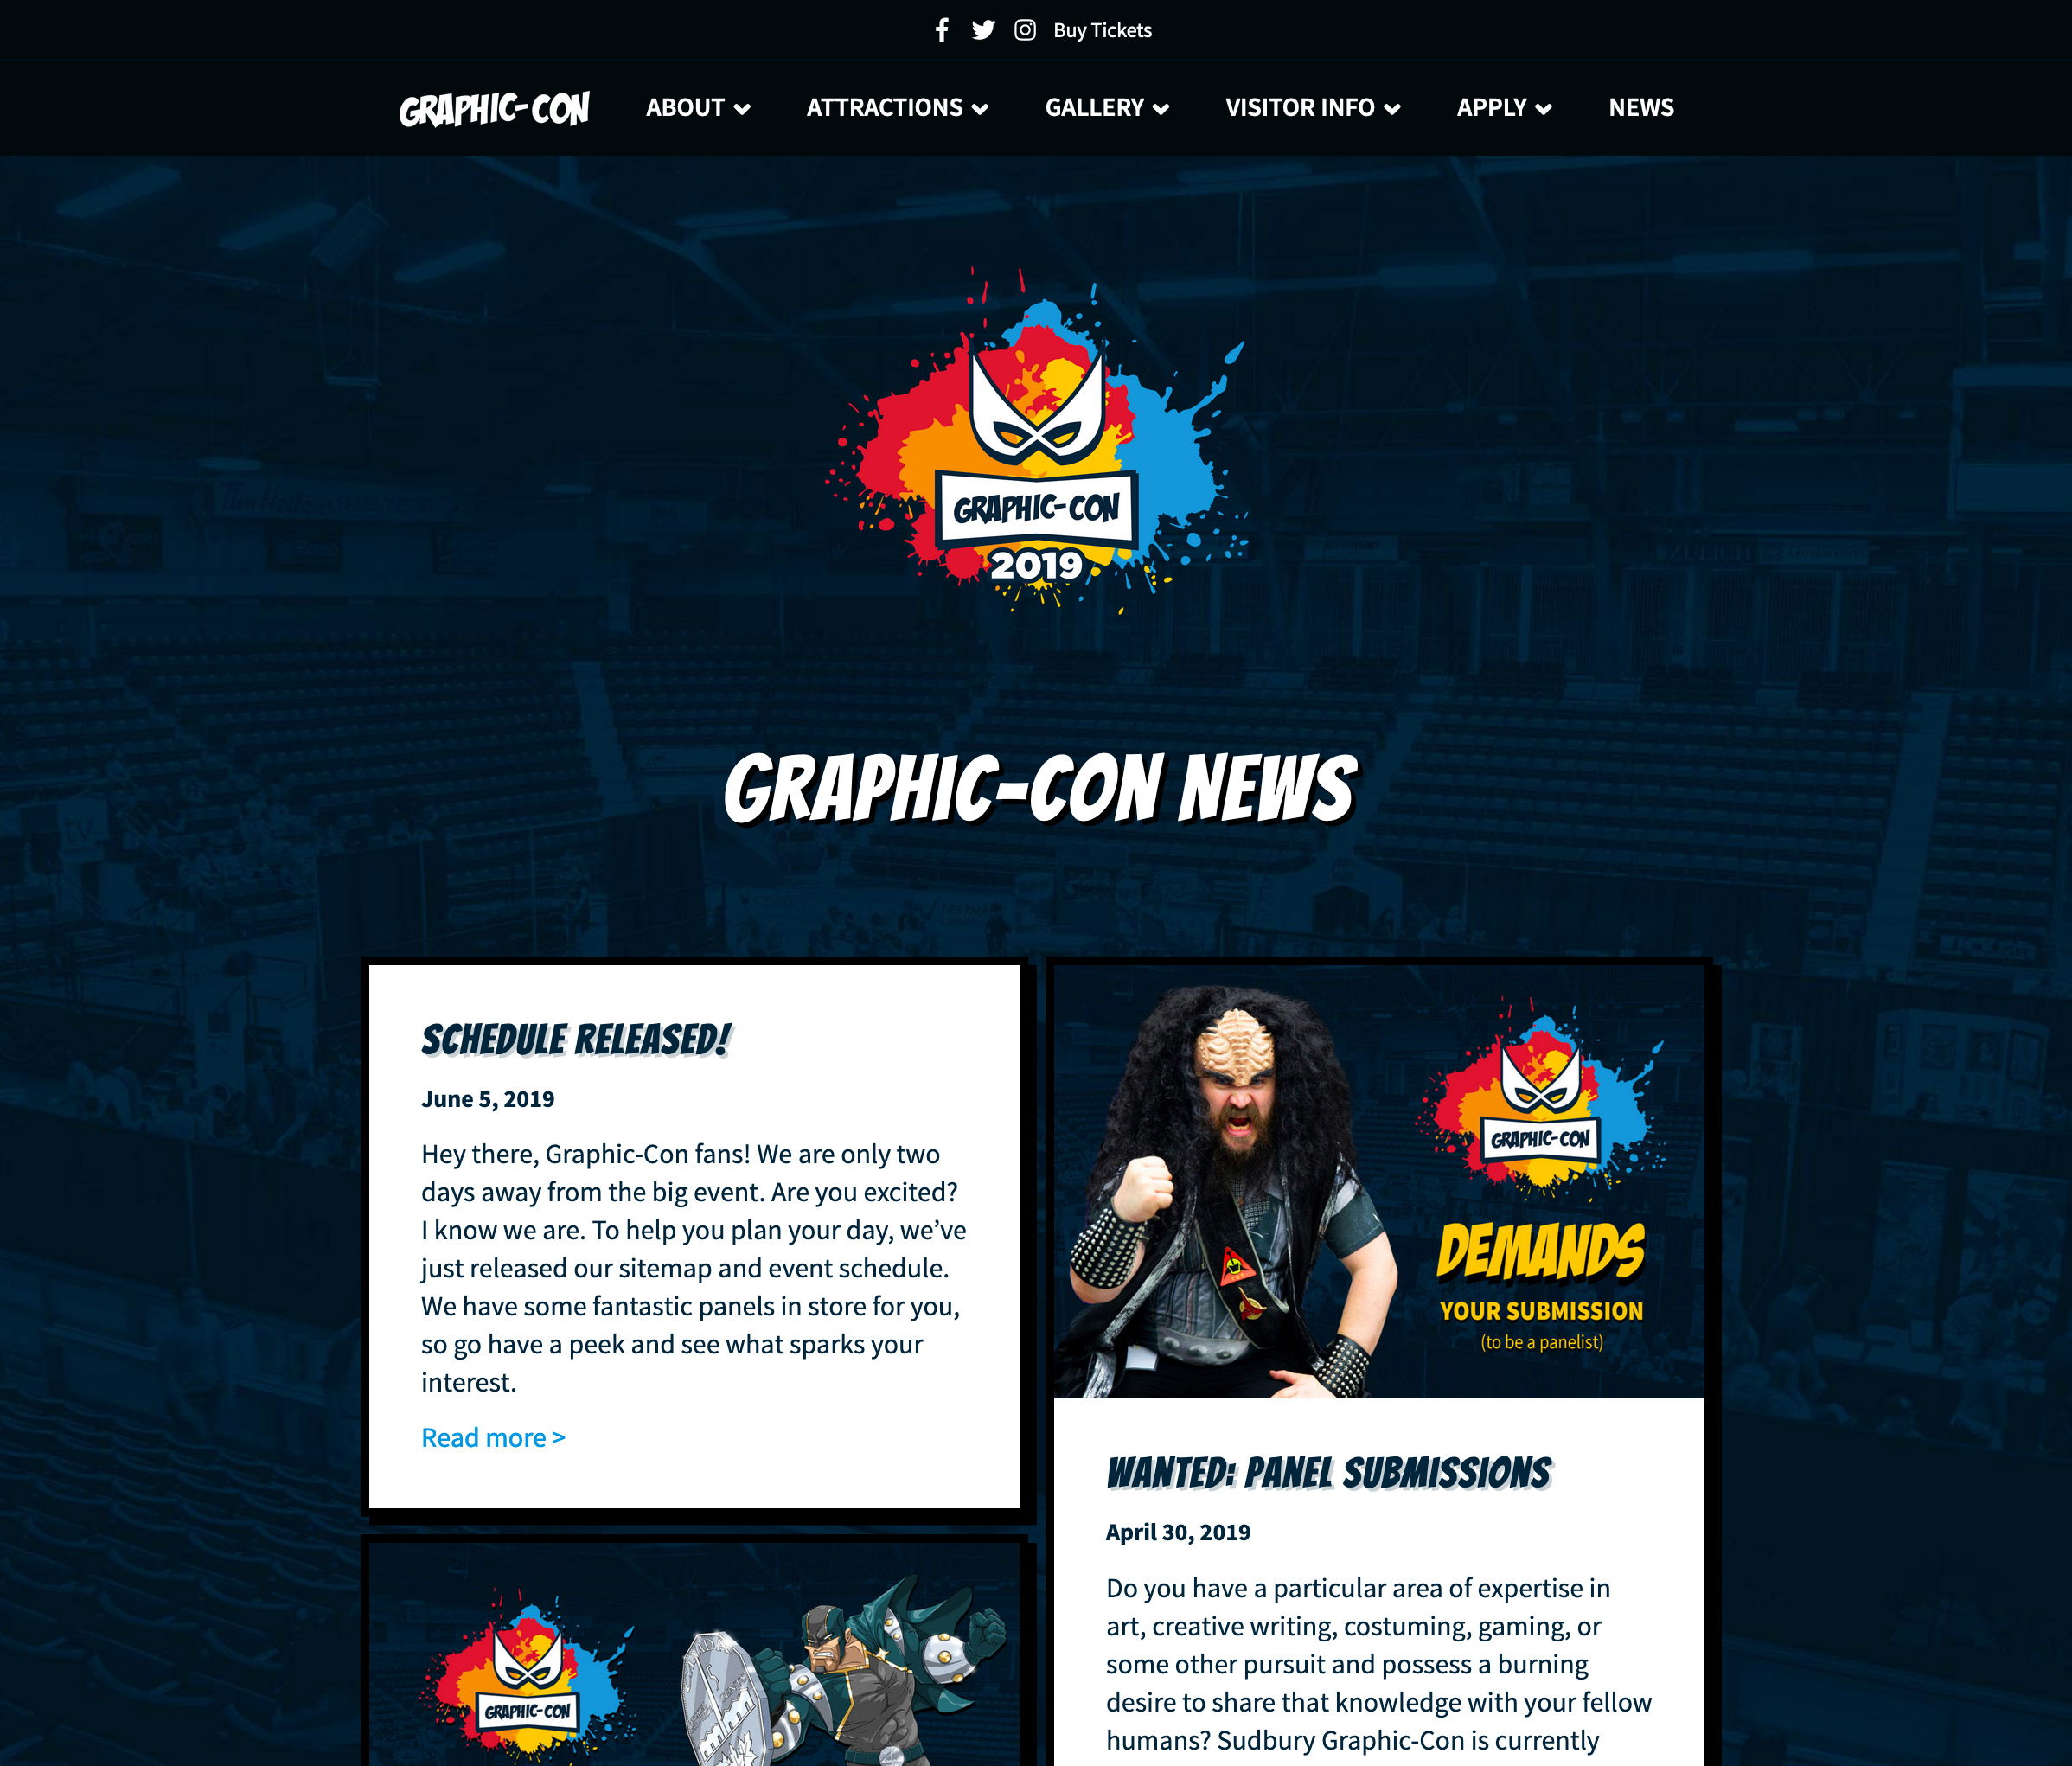 GC-web-news